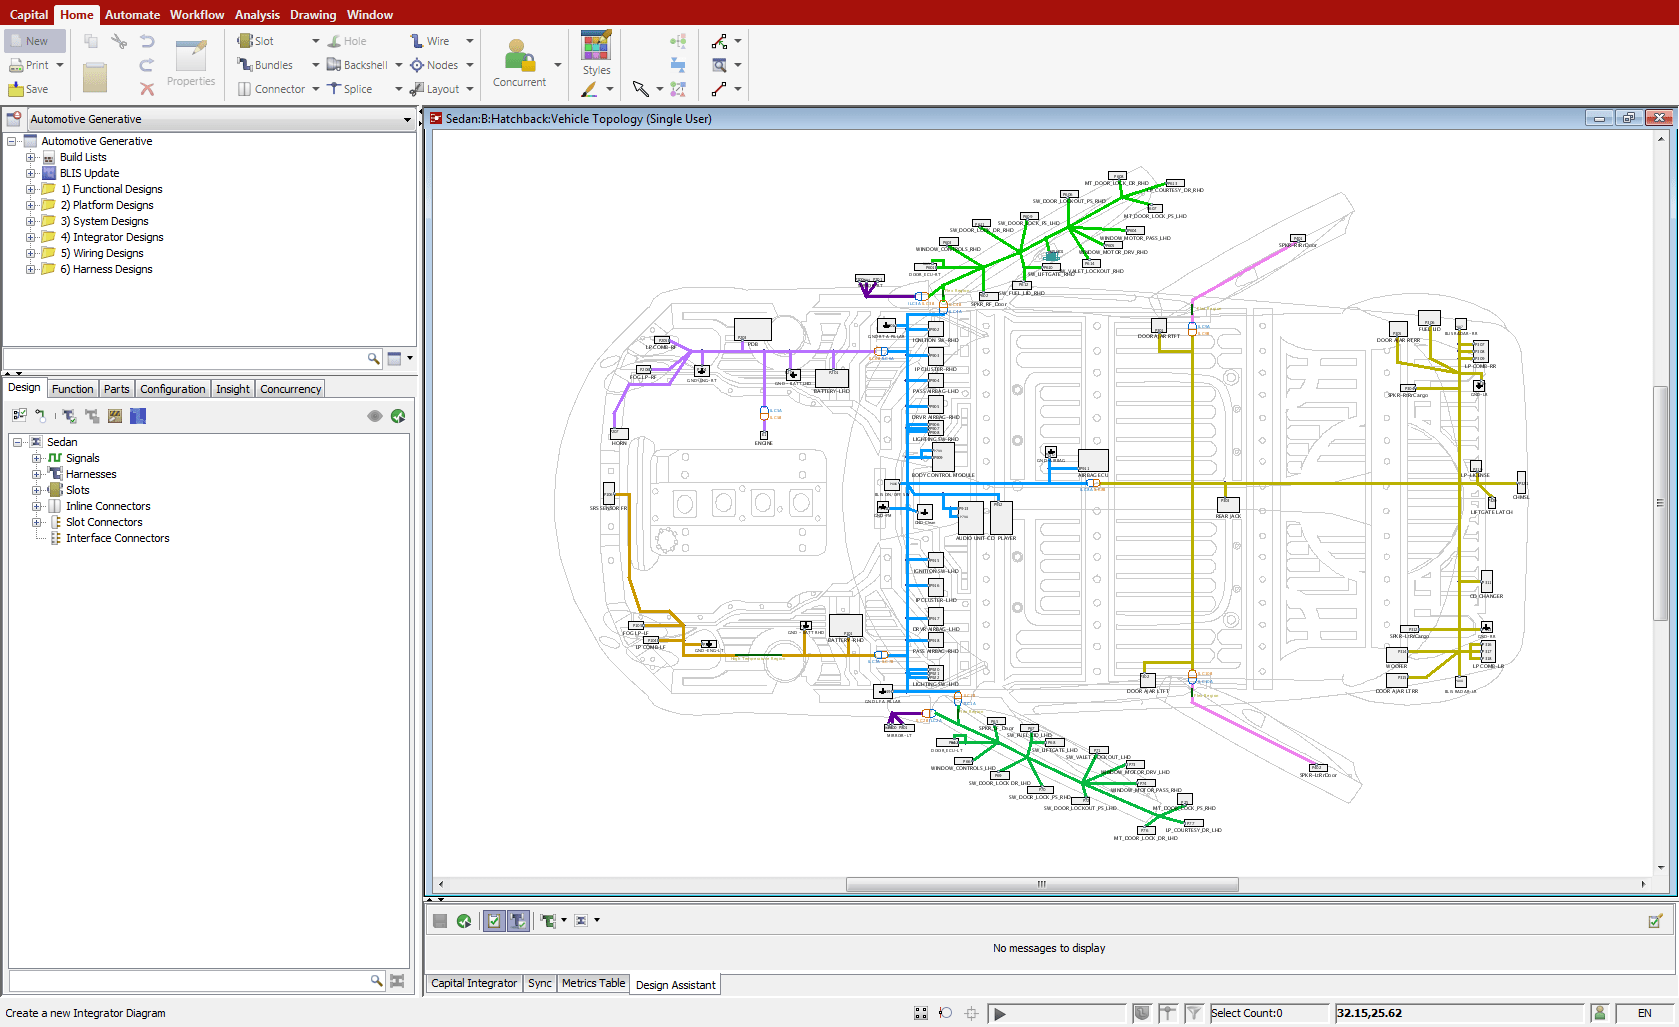 wrg 3746 home wiring designcapital integrator capital integrator electrical design [ 1679 x 1027 Pixel ]